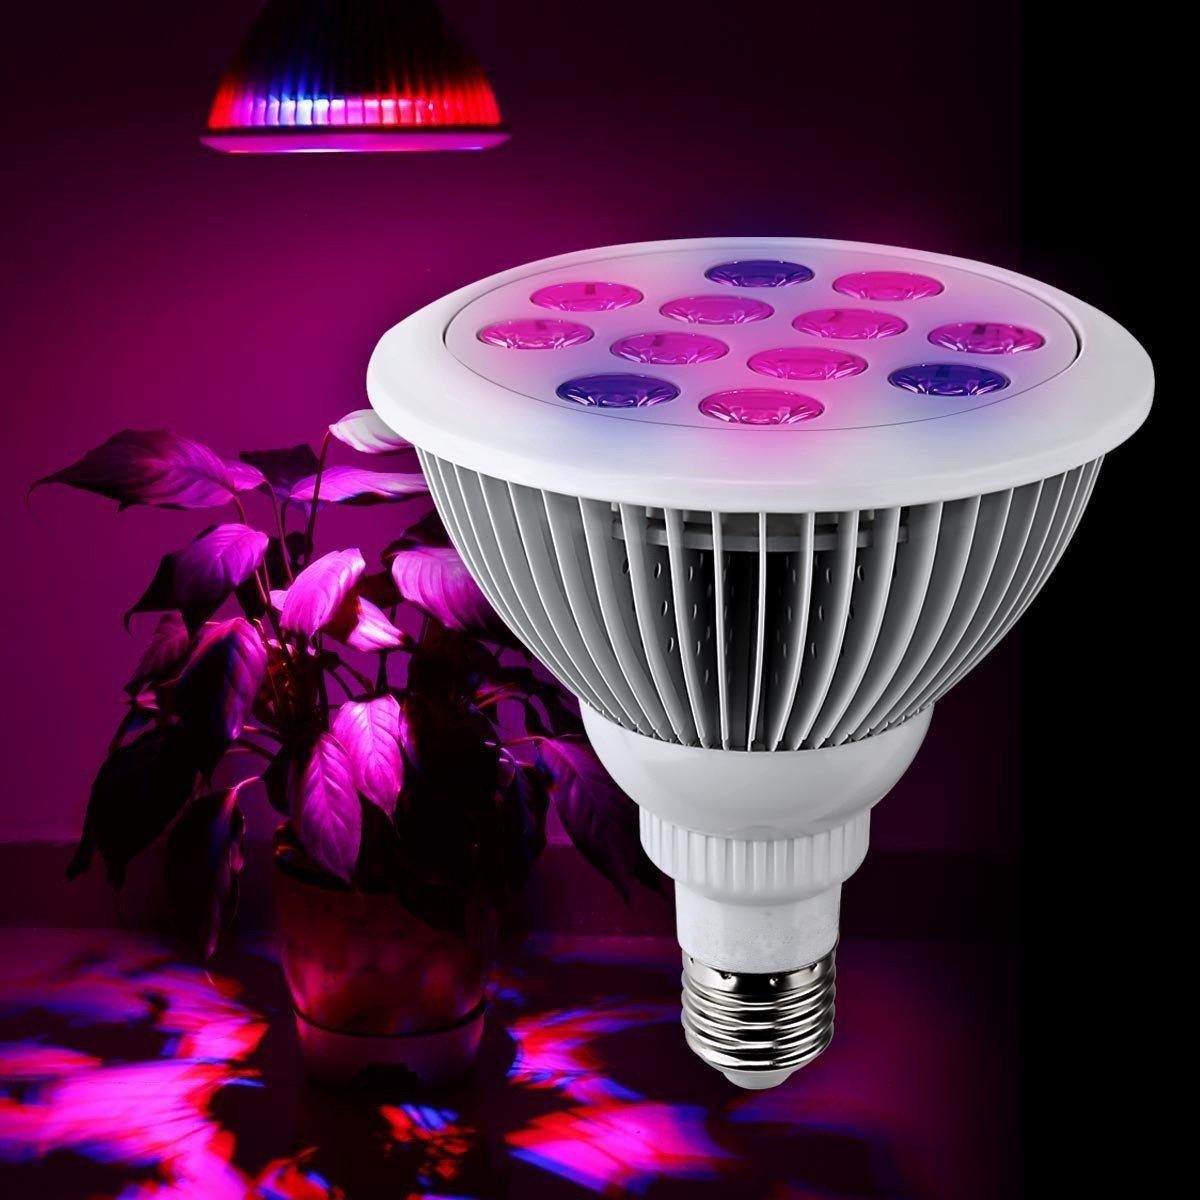 ELEOPTIONE27 LED Grow Lights Grow Light Grow Lights for Aquatic Plants Seeds Indoor Plants Flower Vegetables etc. (24W)